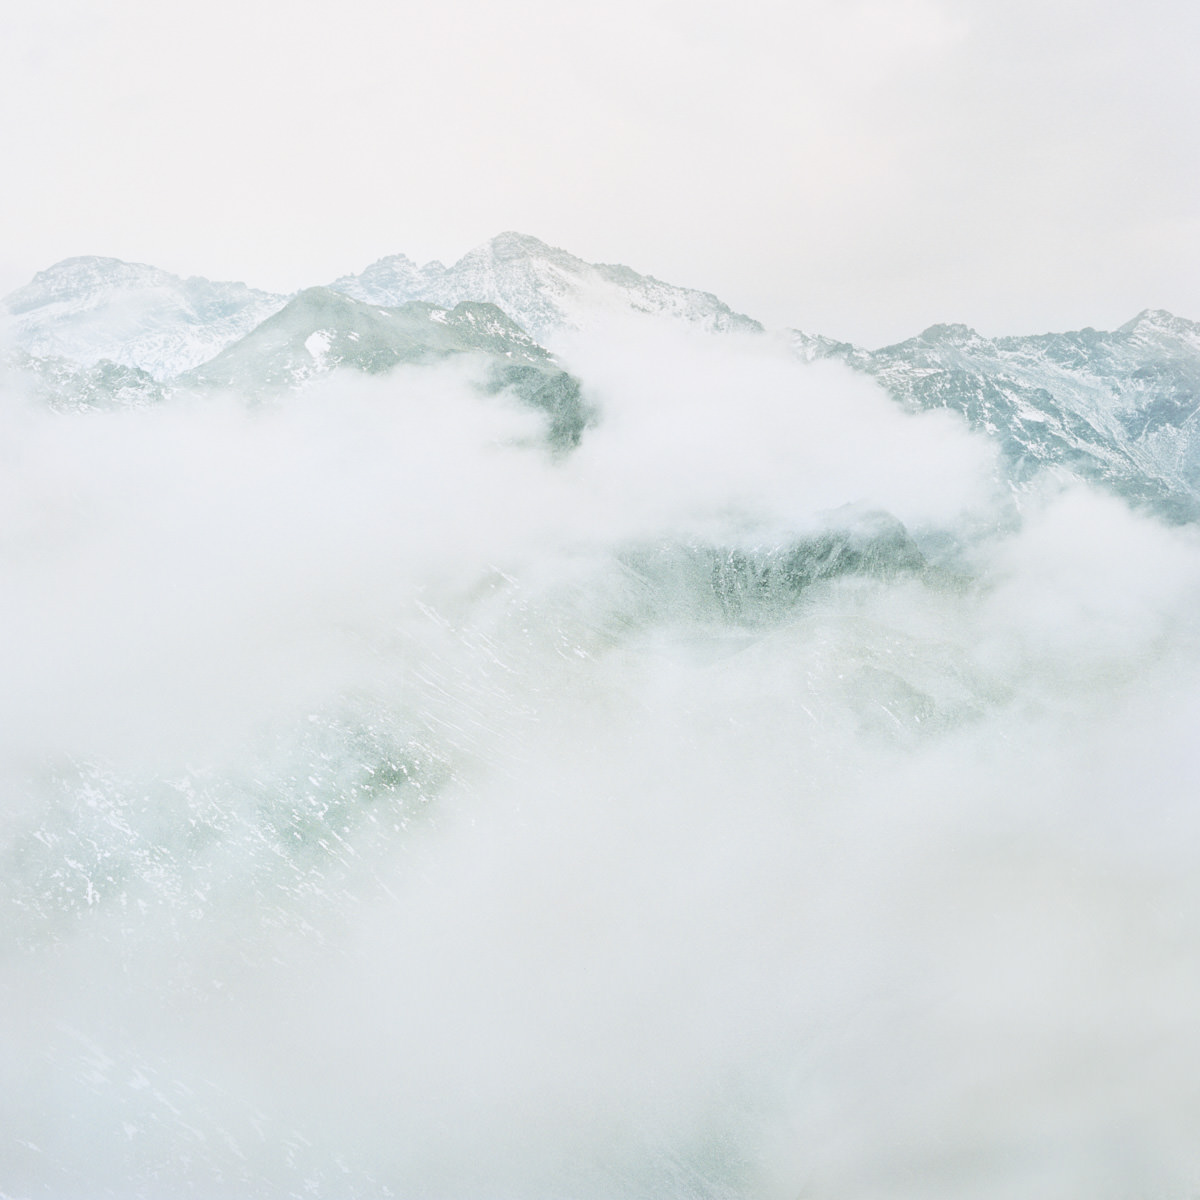 splügen pass berge nebel wandern gipfel horizont landschaft italien jörn strojny